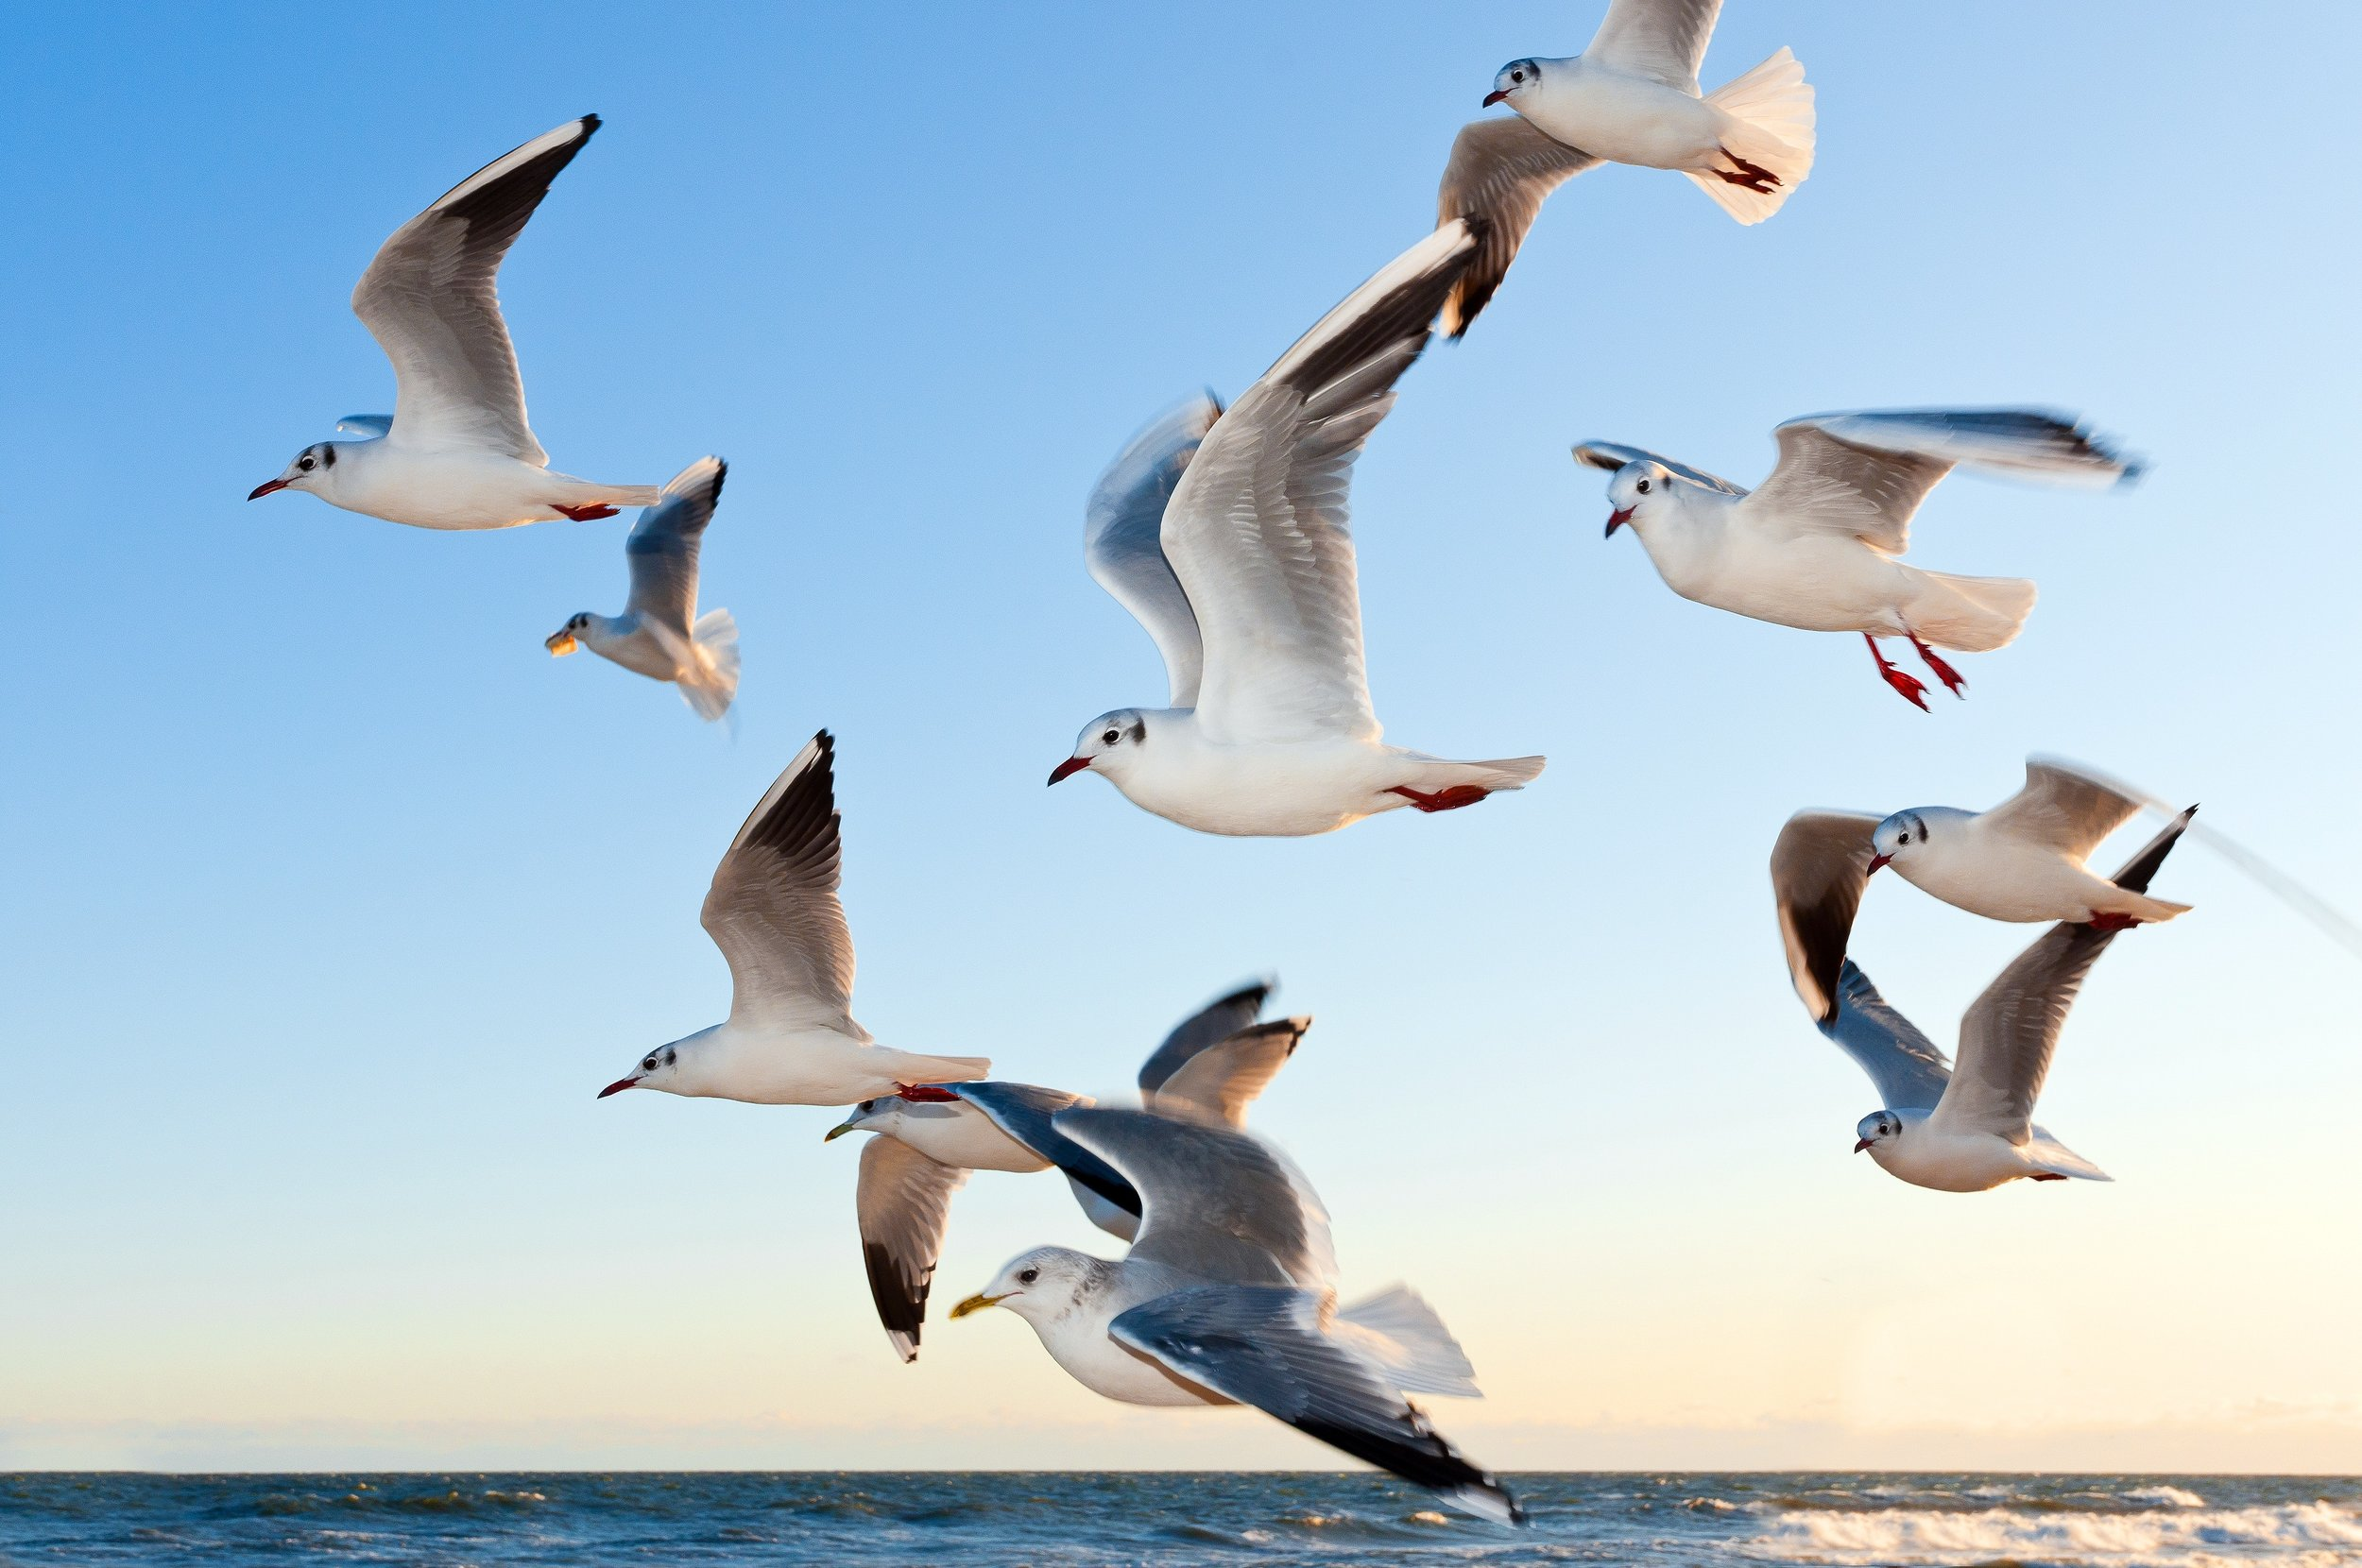 animals-birds-flying-54462.jpg